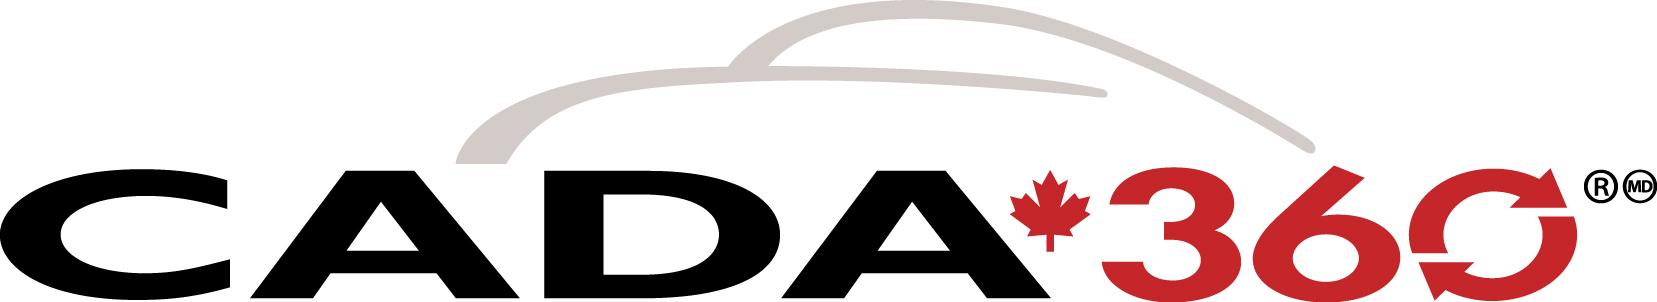 CADA 360 - Car dealership Employee Benefit Plan